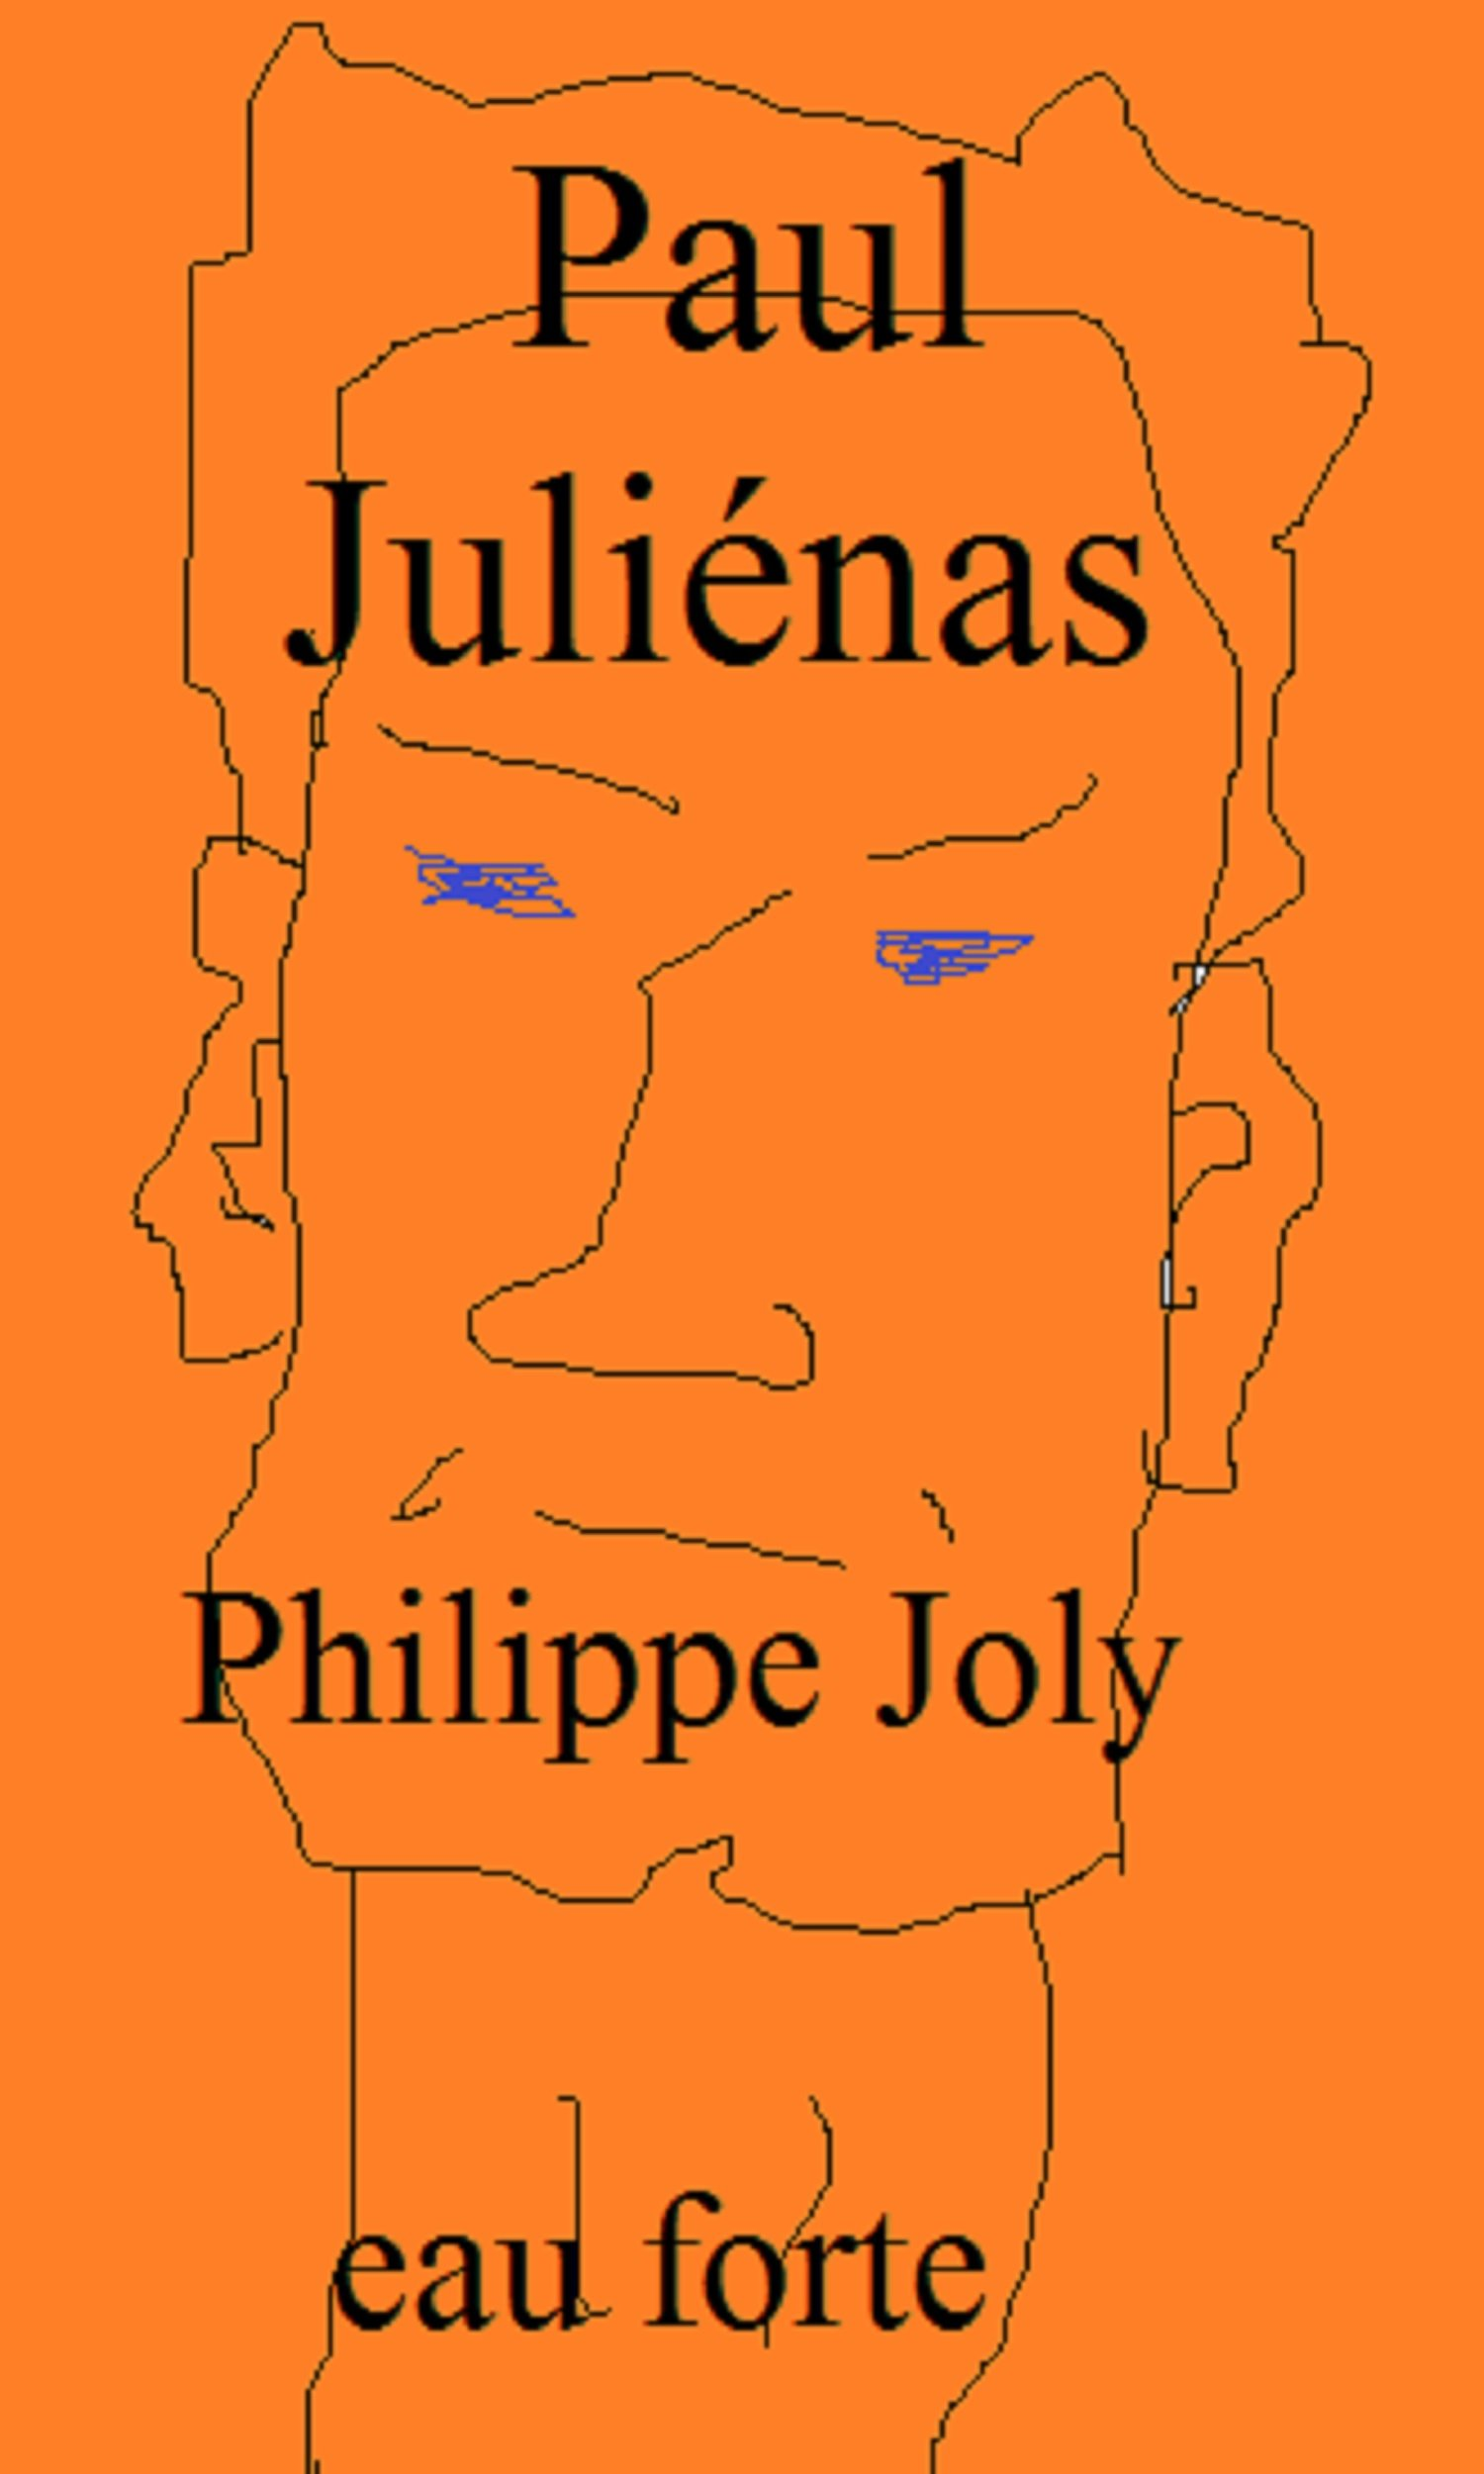 PAUL JULIENAS